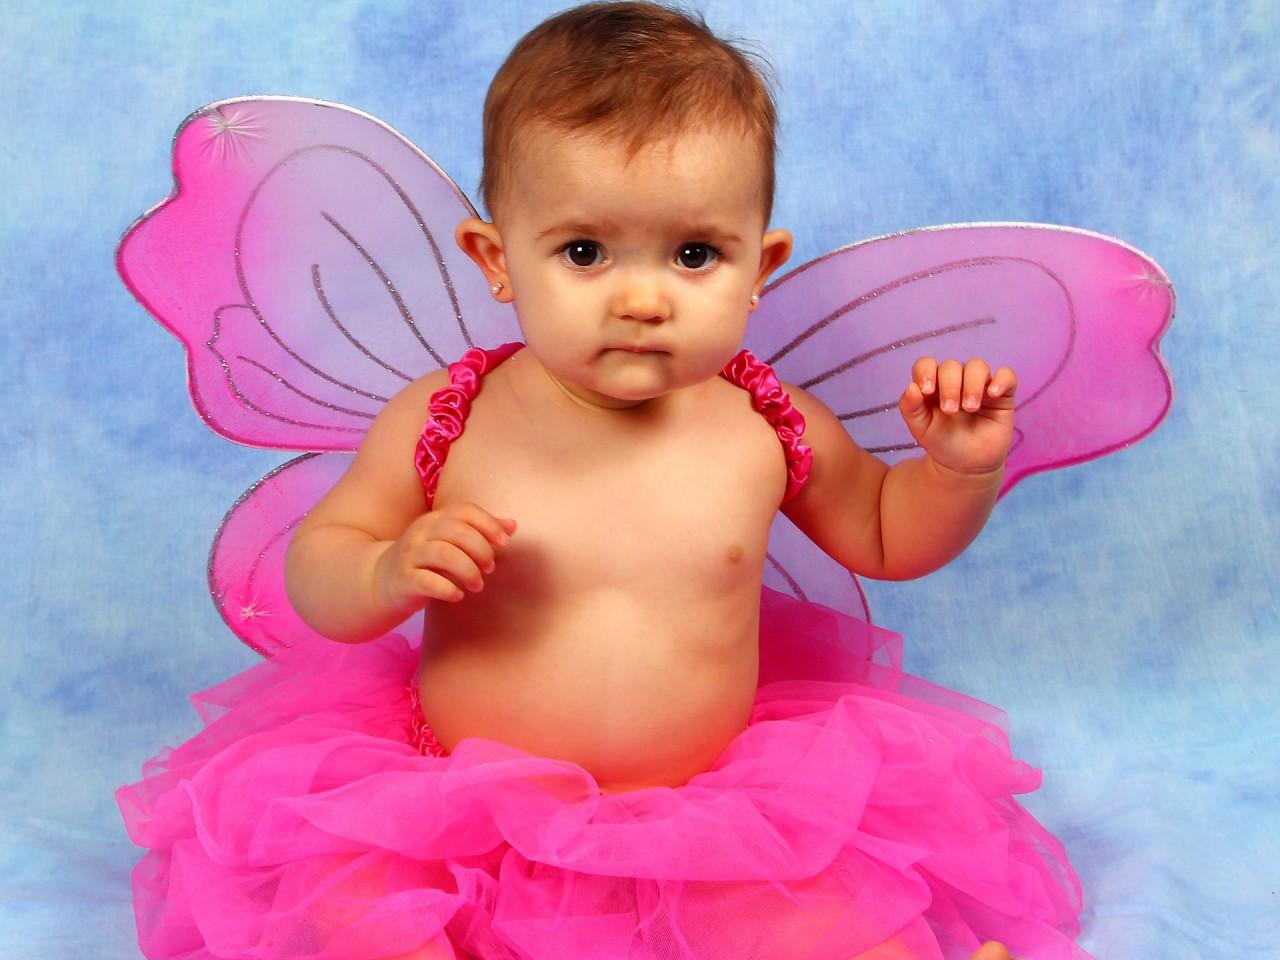 Baby Girl Wallpaper Full Hd Cute Baby Girl Wallpapers Hd Wallpapers Id 6500